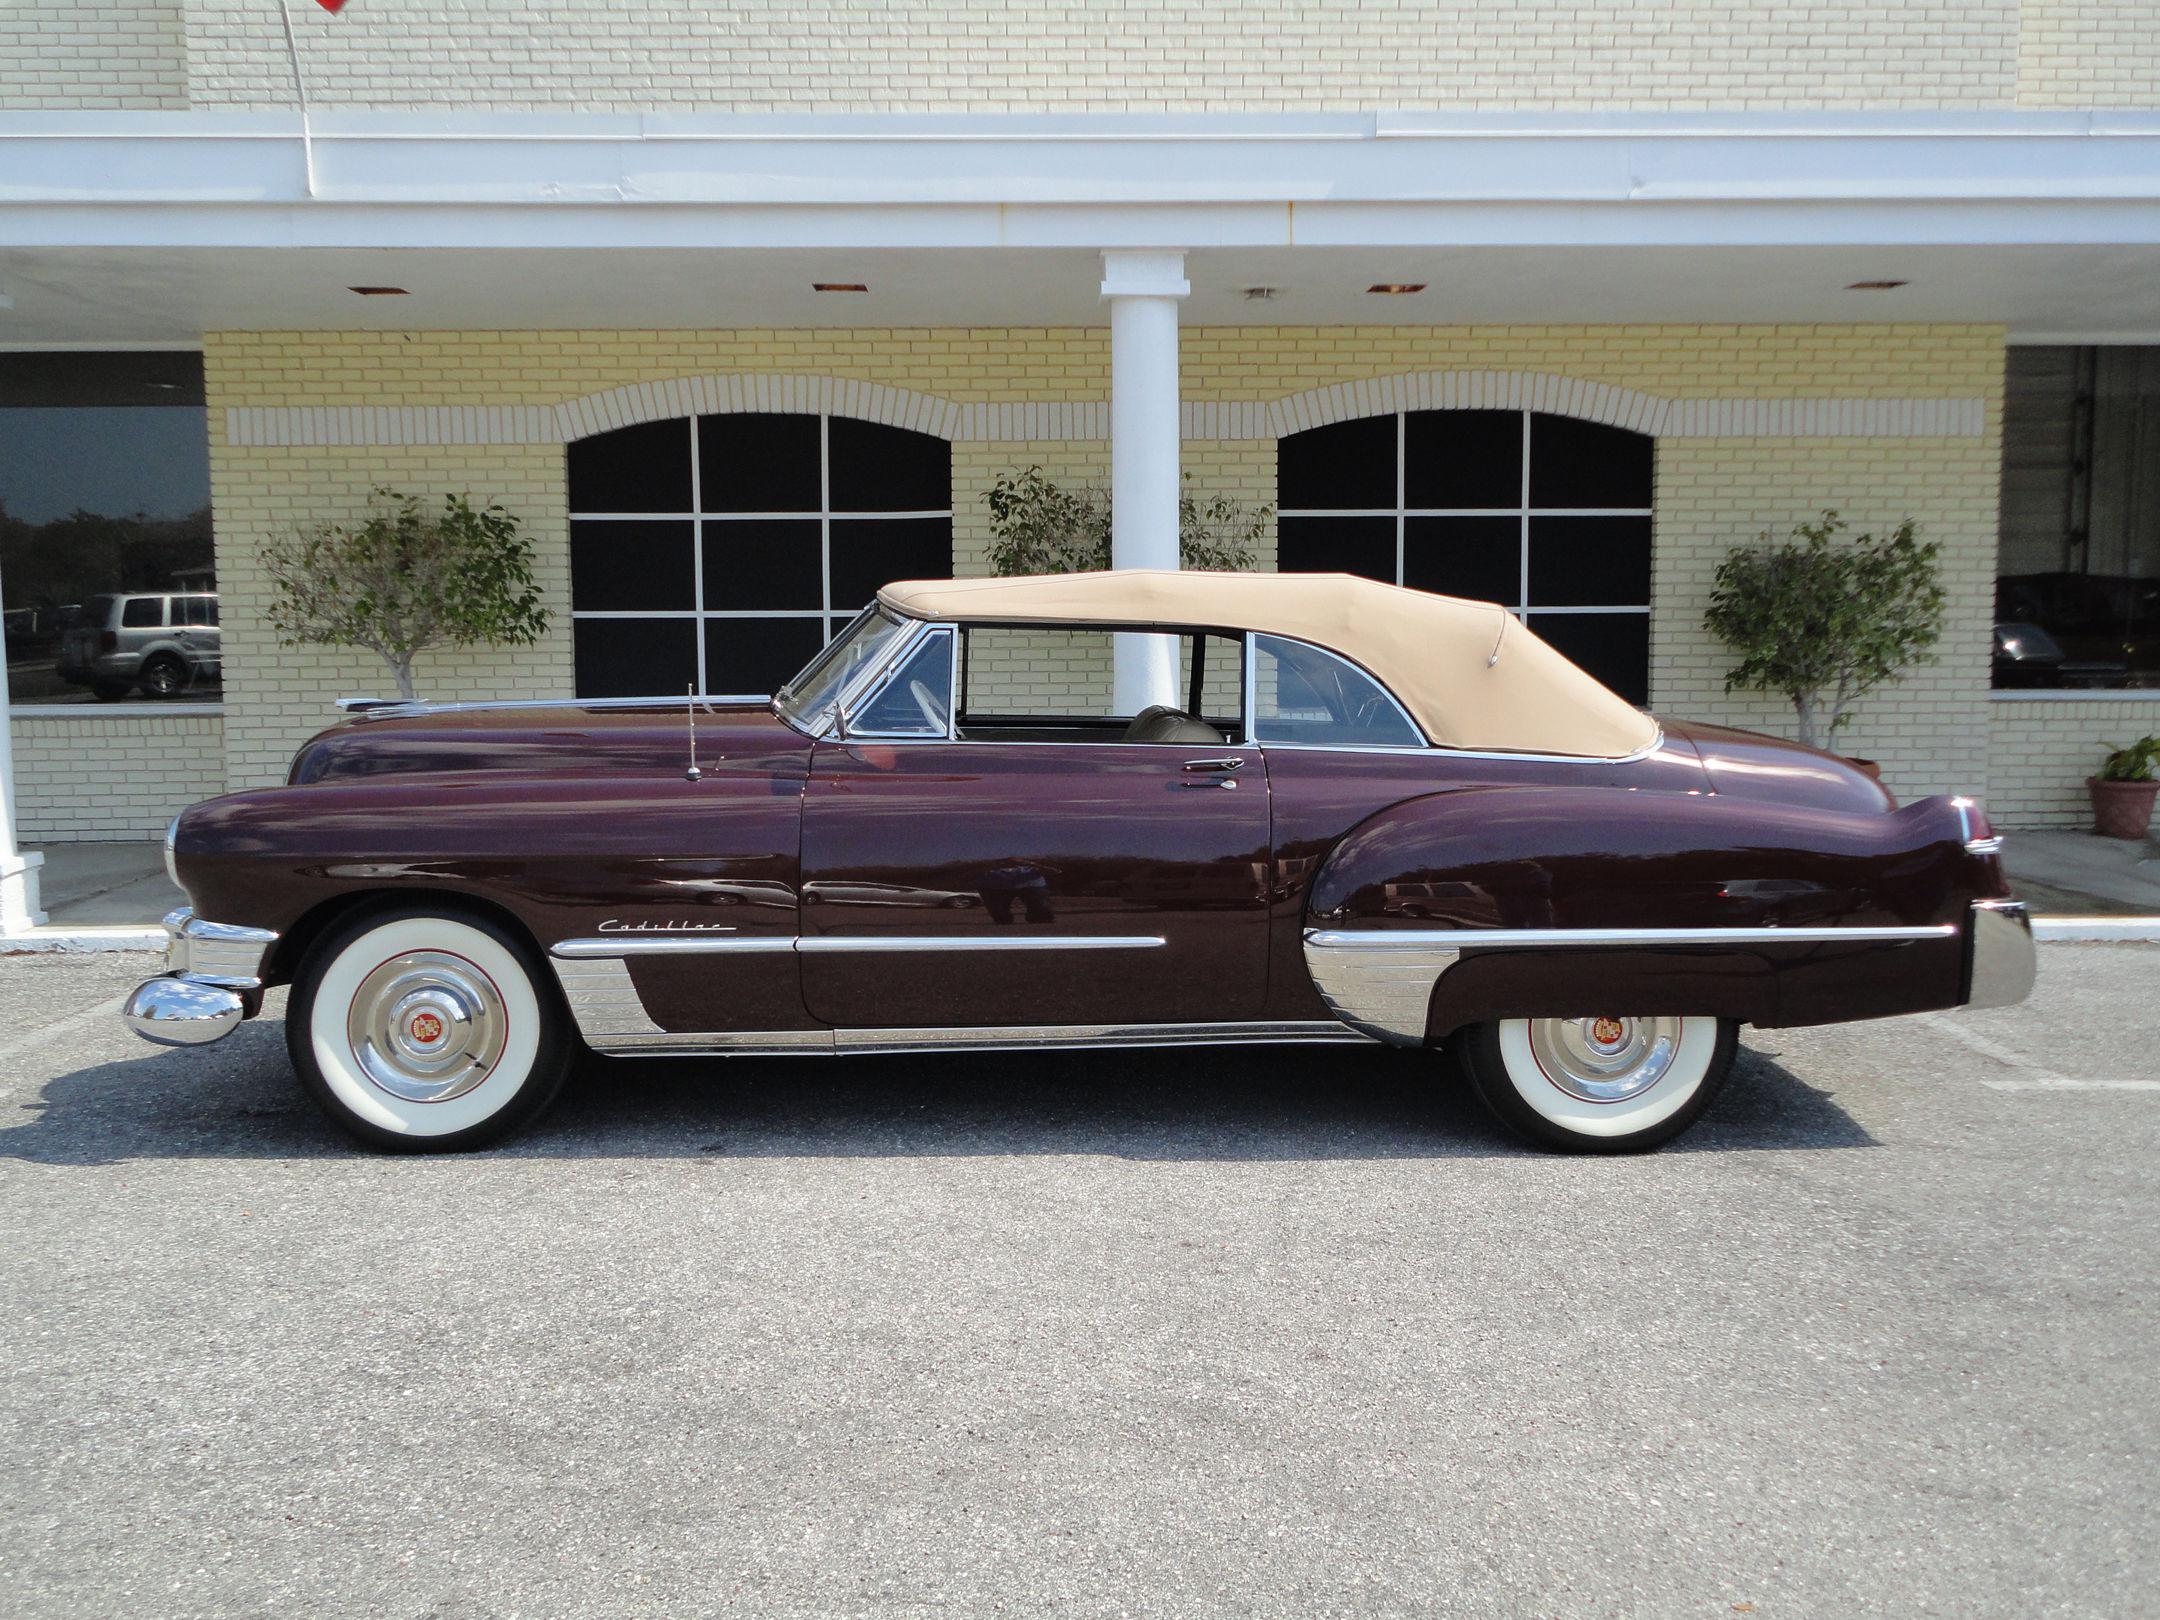 No TV antenna in the back? Car photo via vintagemotorssarasota.com